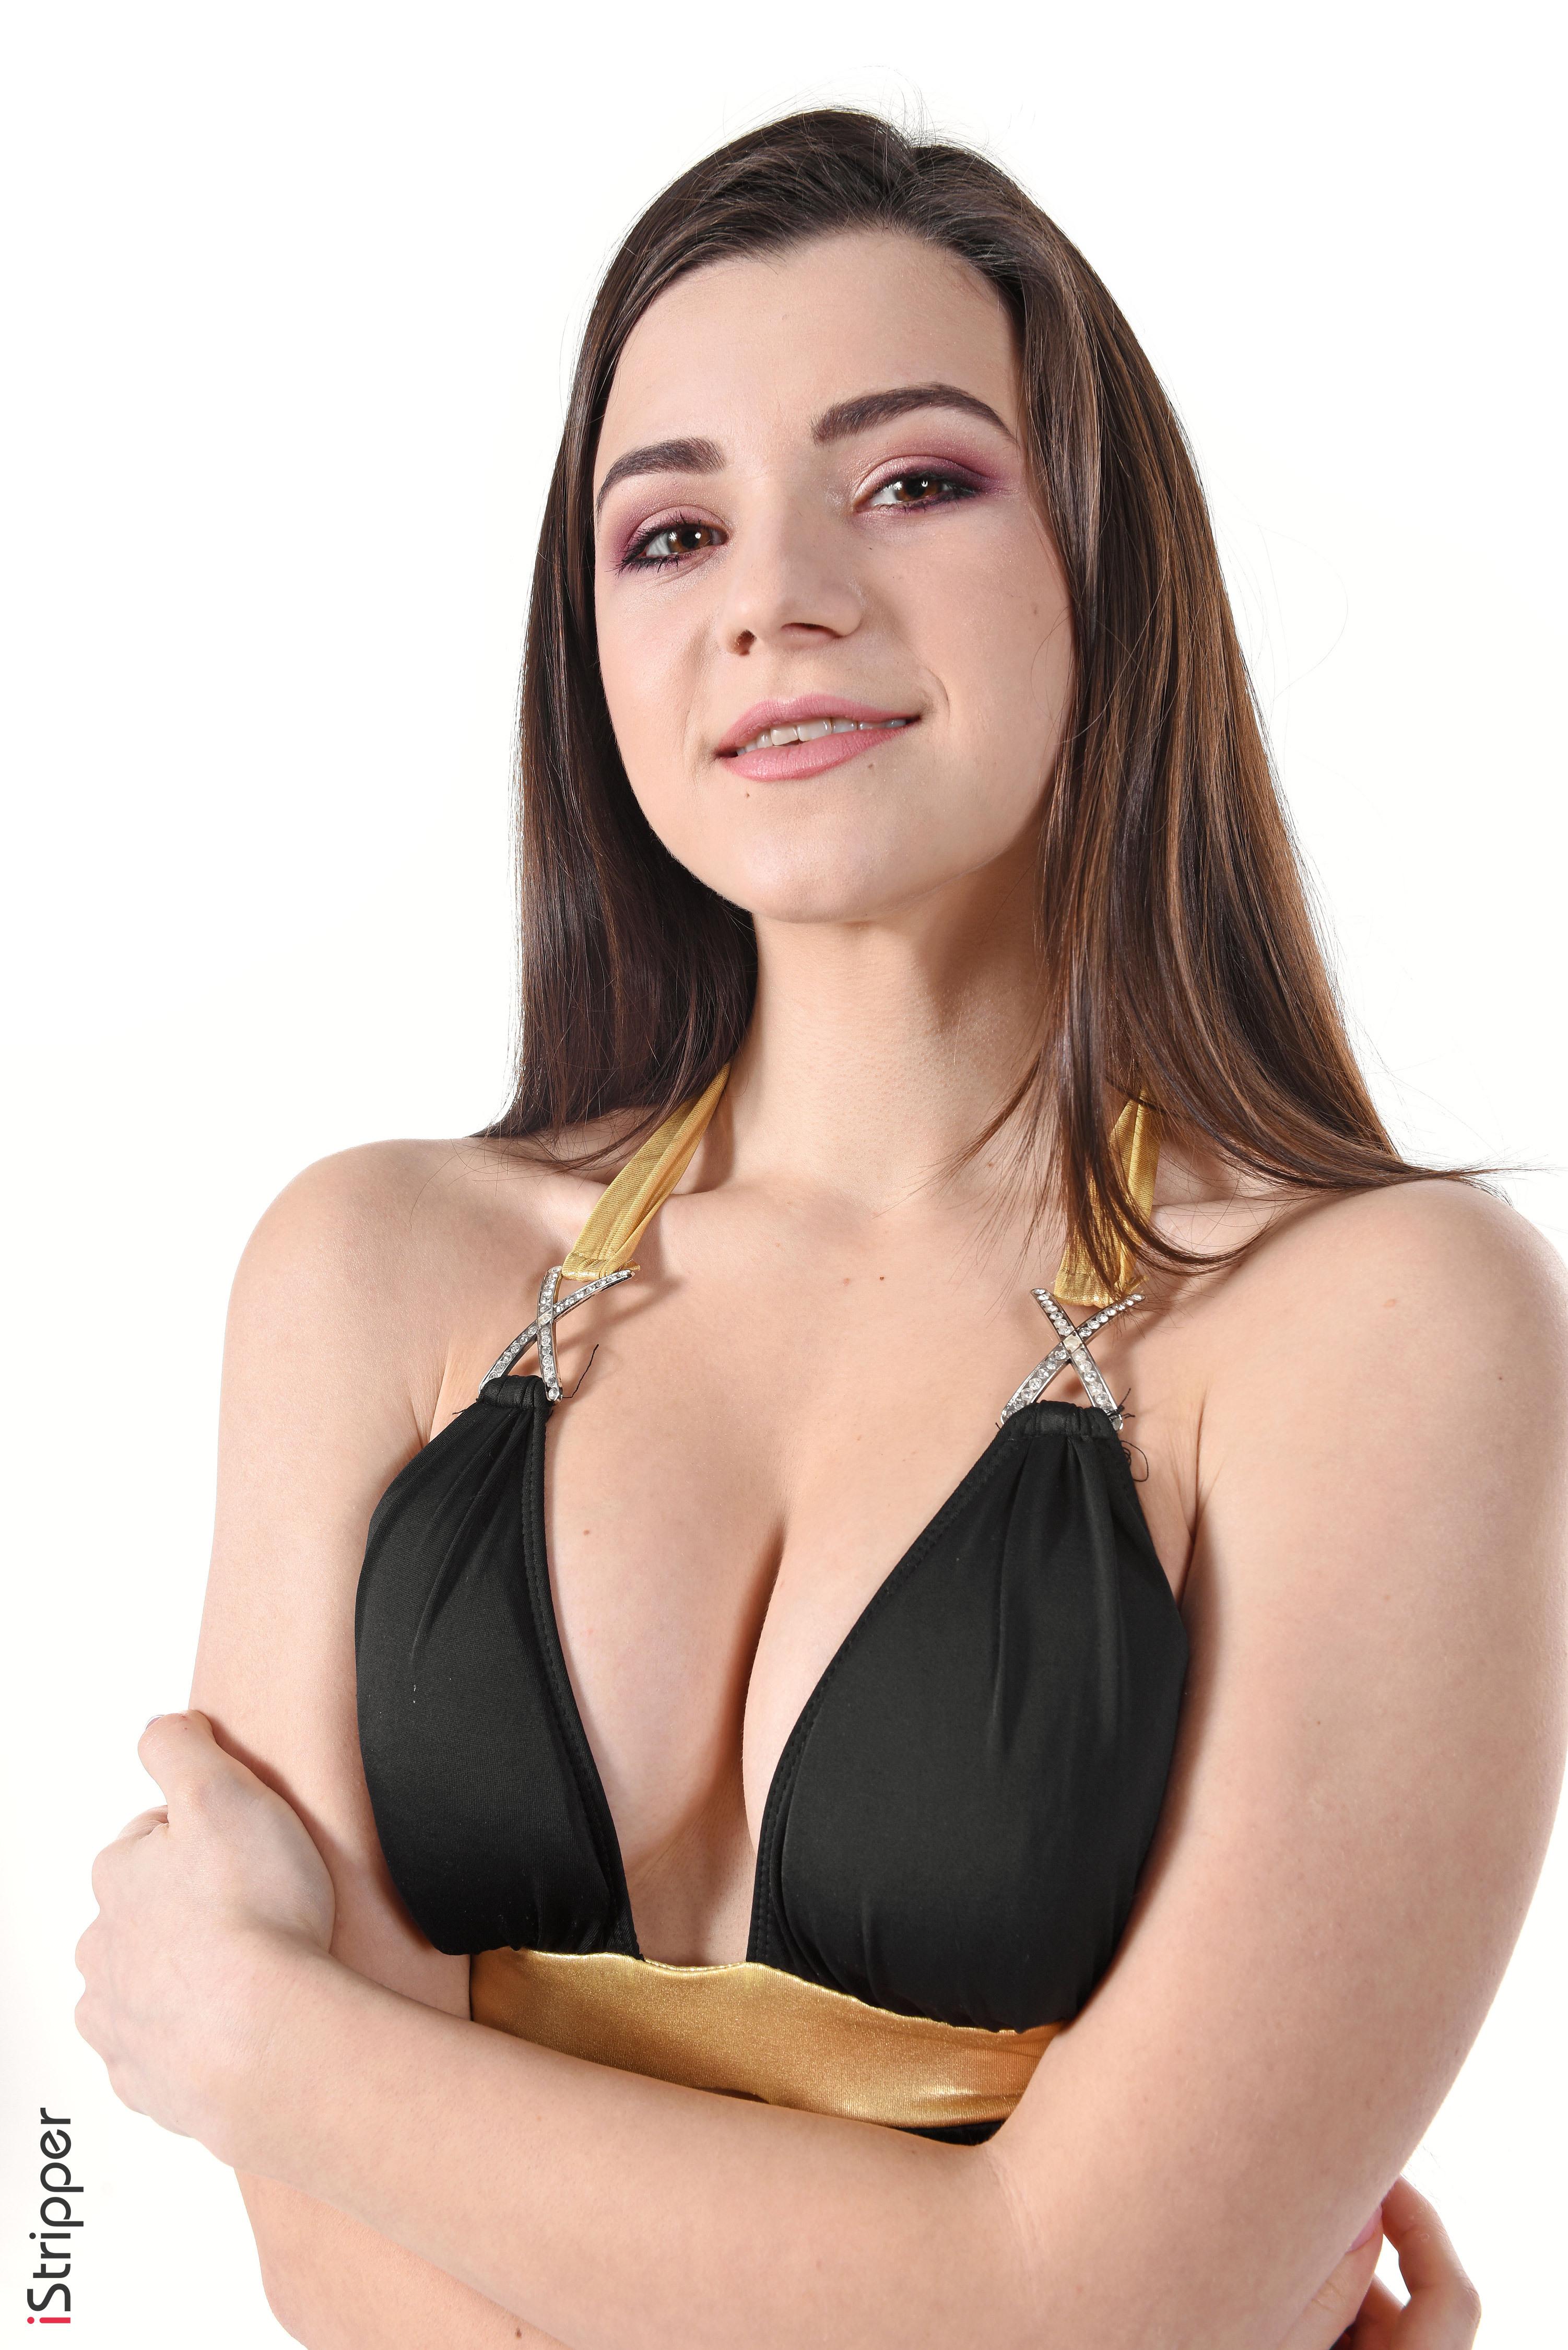 pussy pics upclose